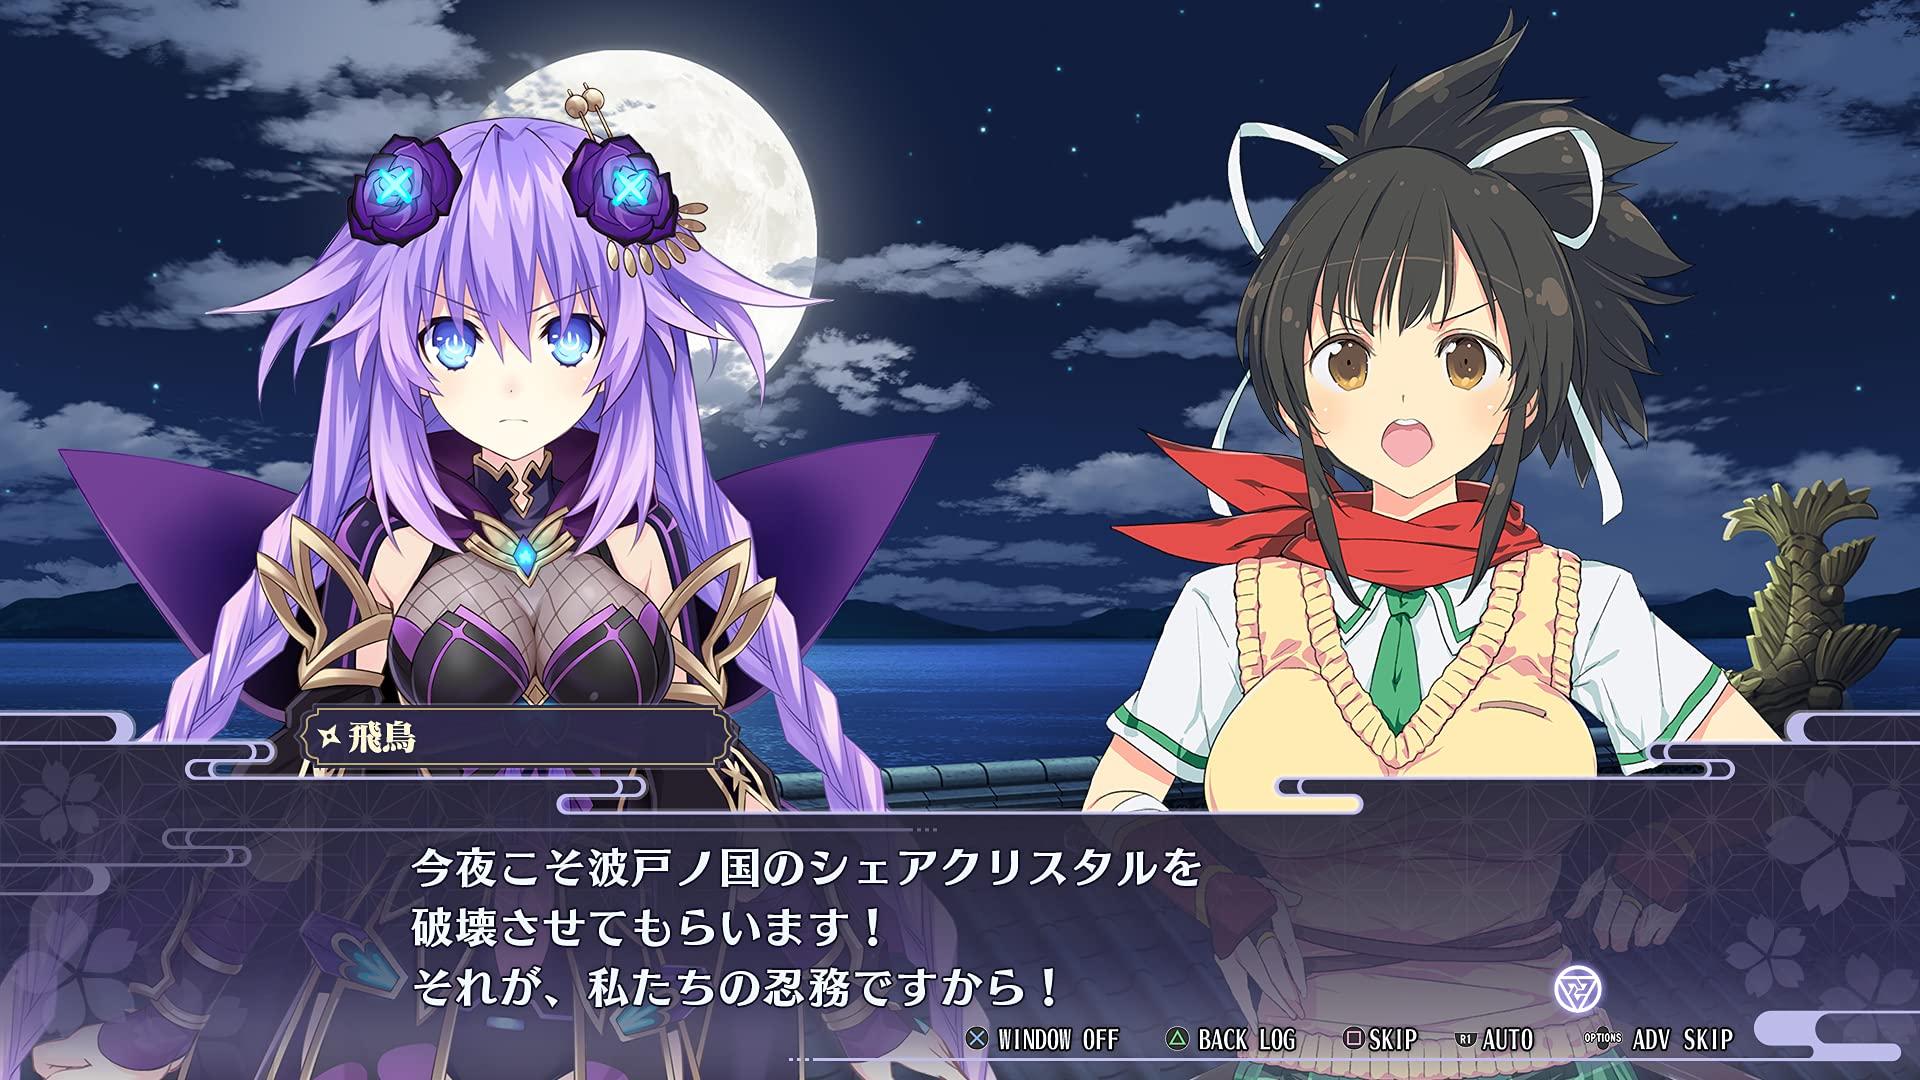 Senran-Nin-Nin-Ninja-Taisen-Neptune-Shou